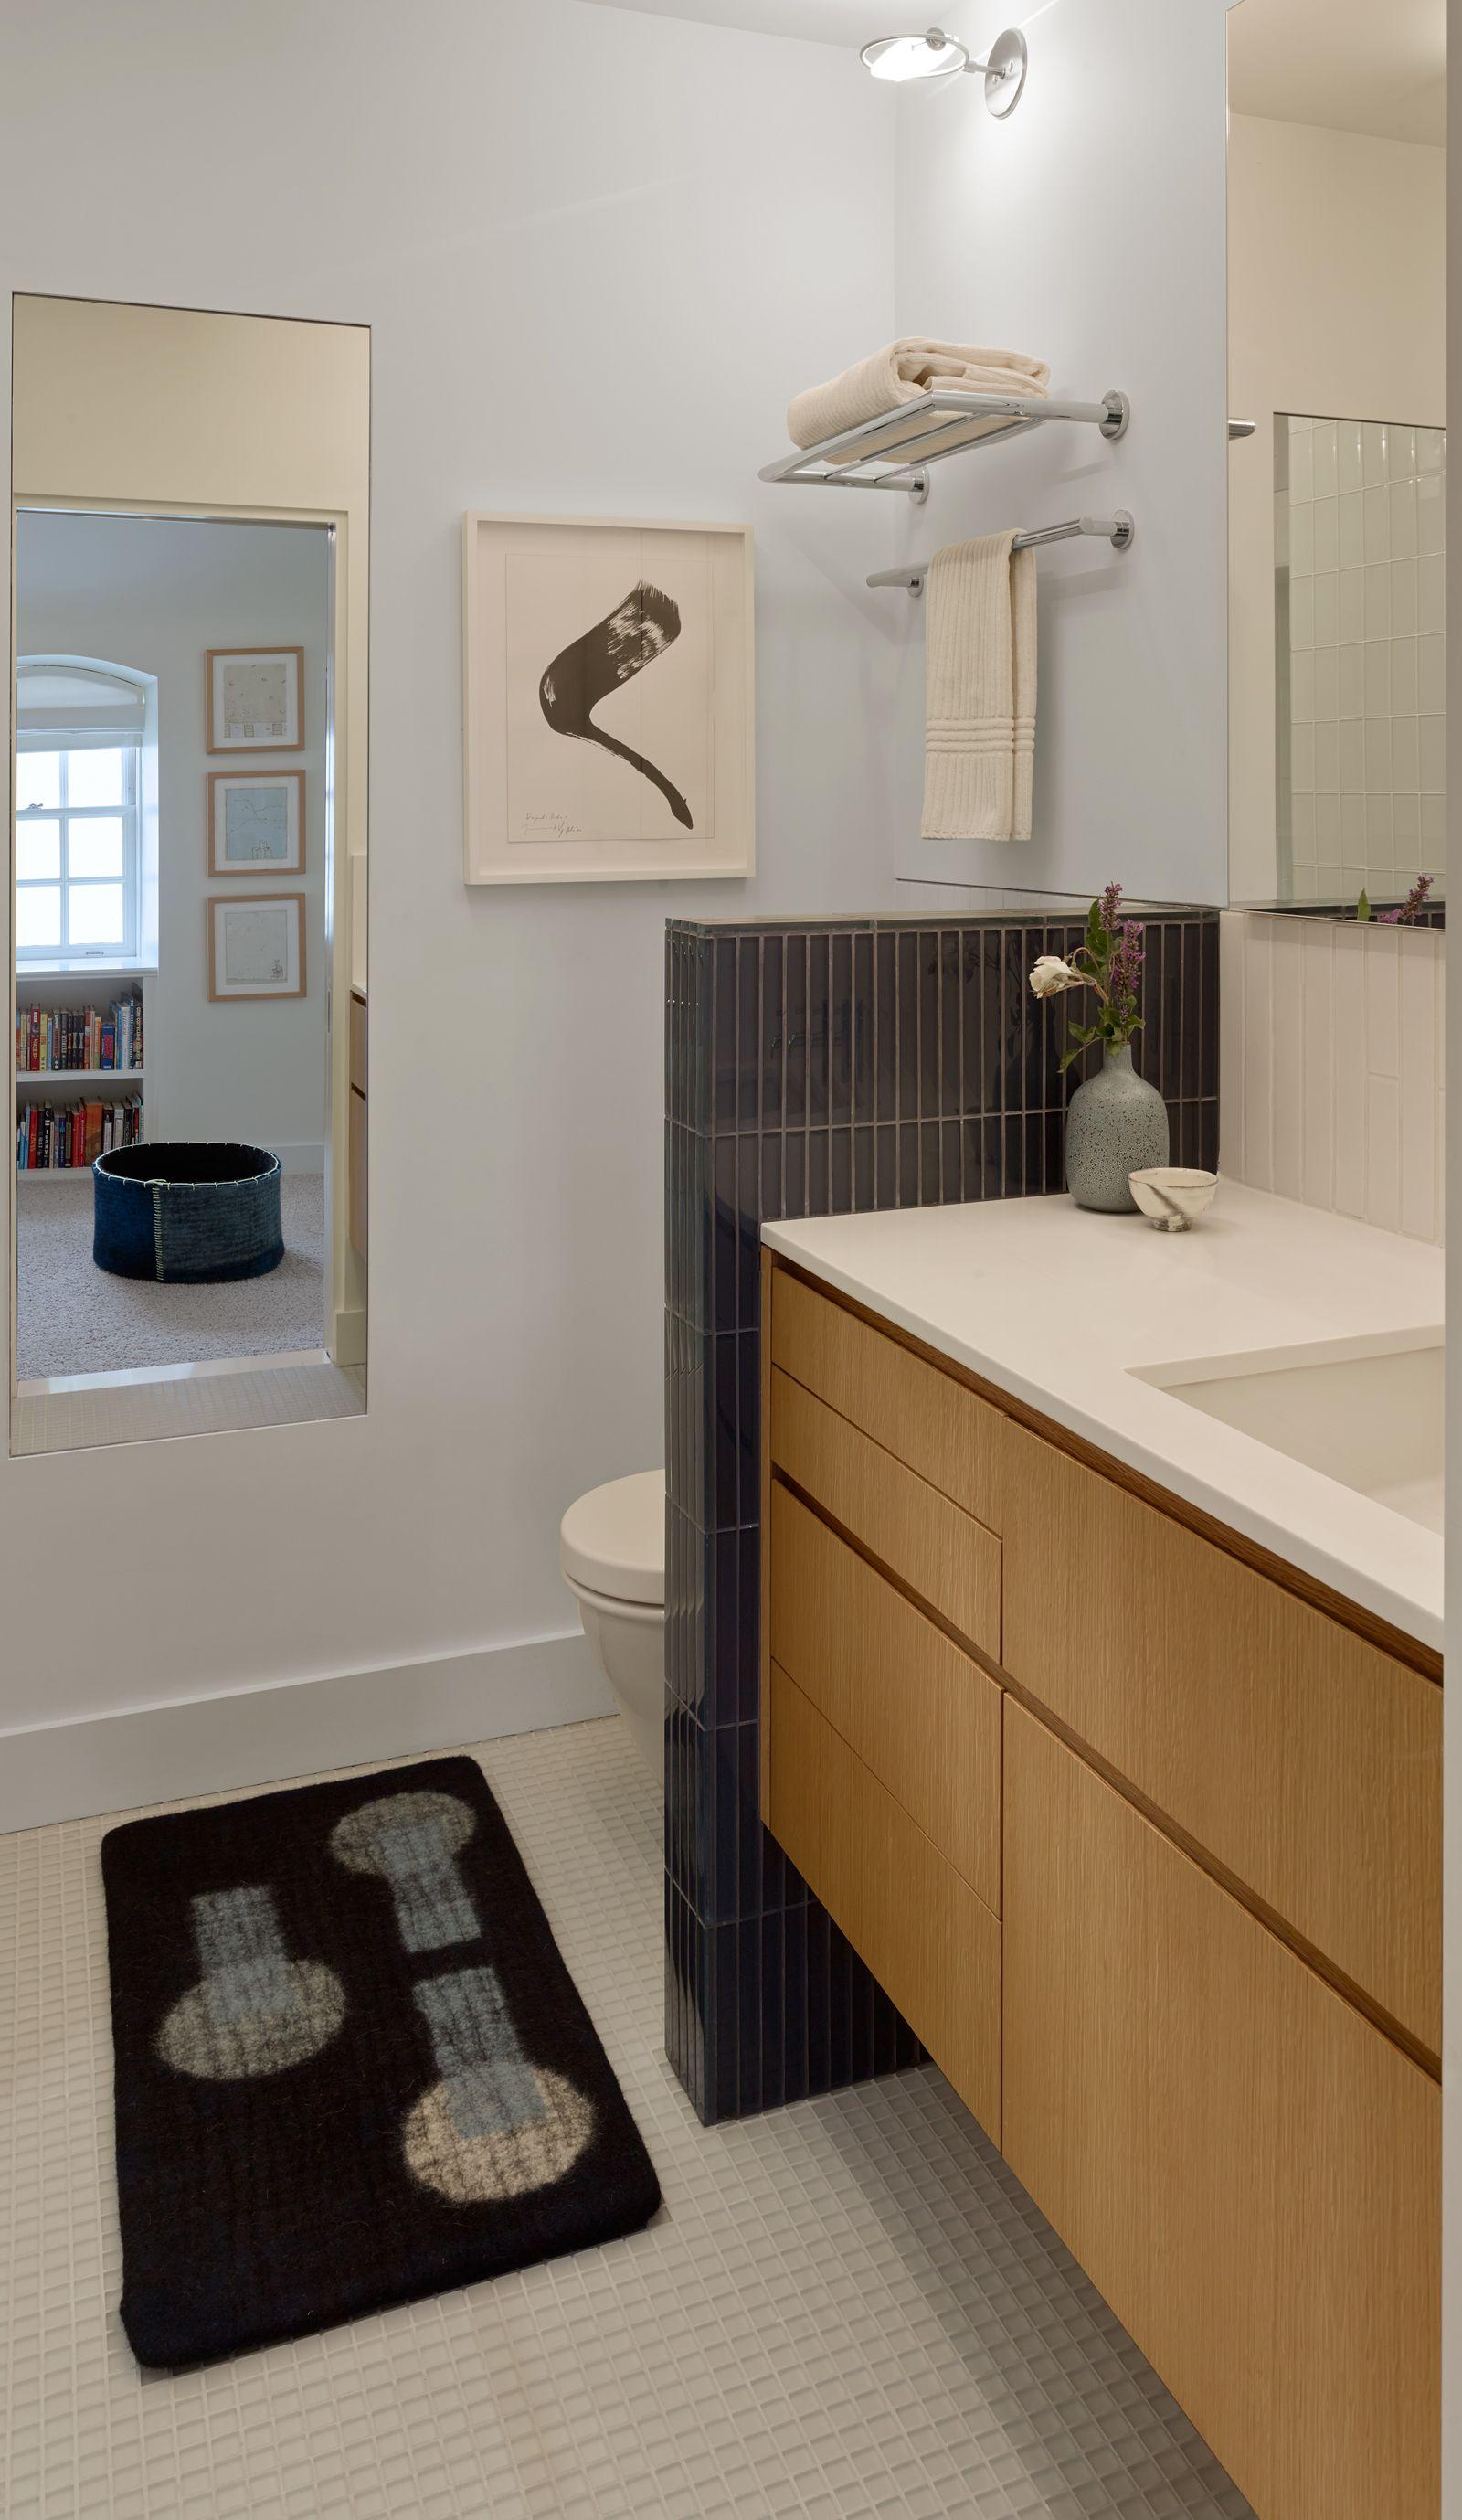 B/S House Phase II - Boy's Bath